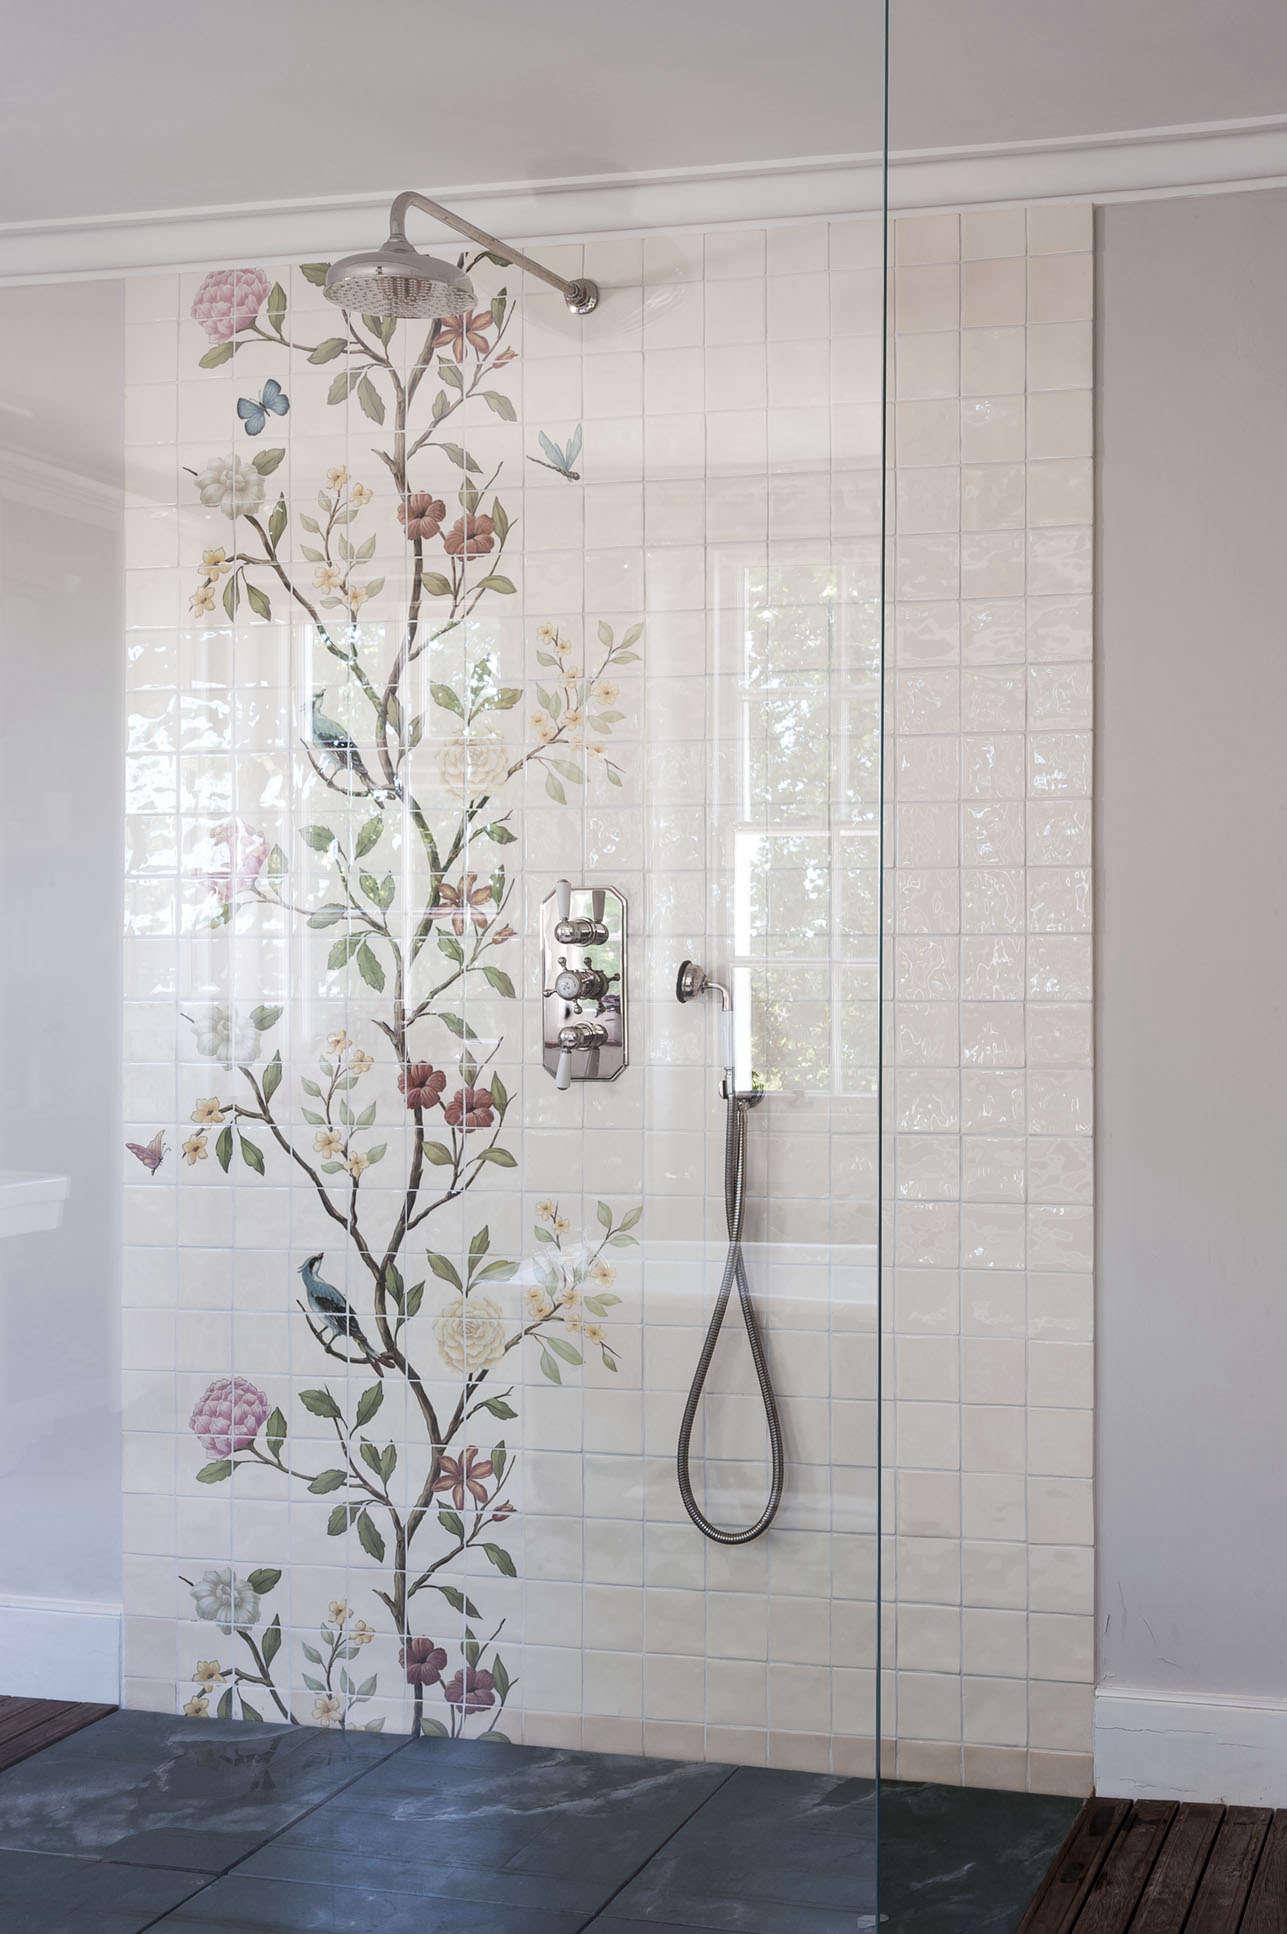 michelle-mckenna-bath-uk-chinoiserie-tile-floral-shower